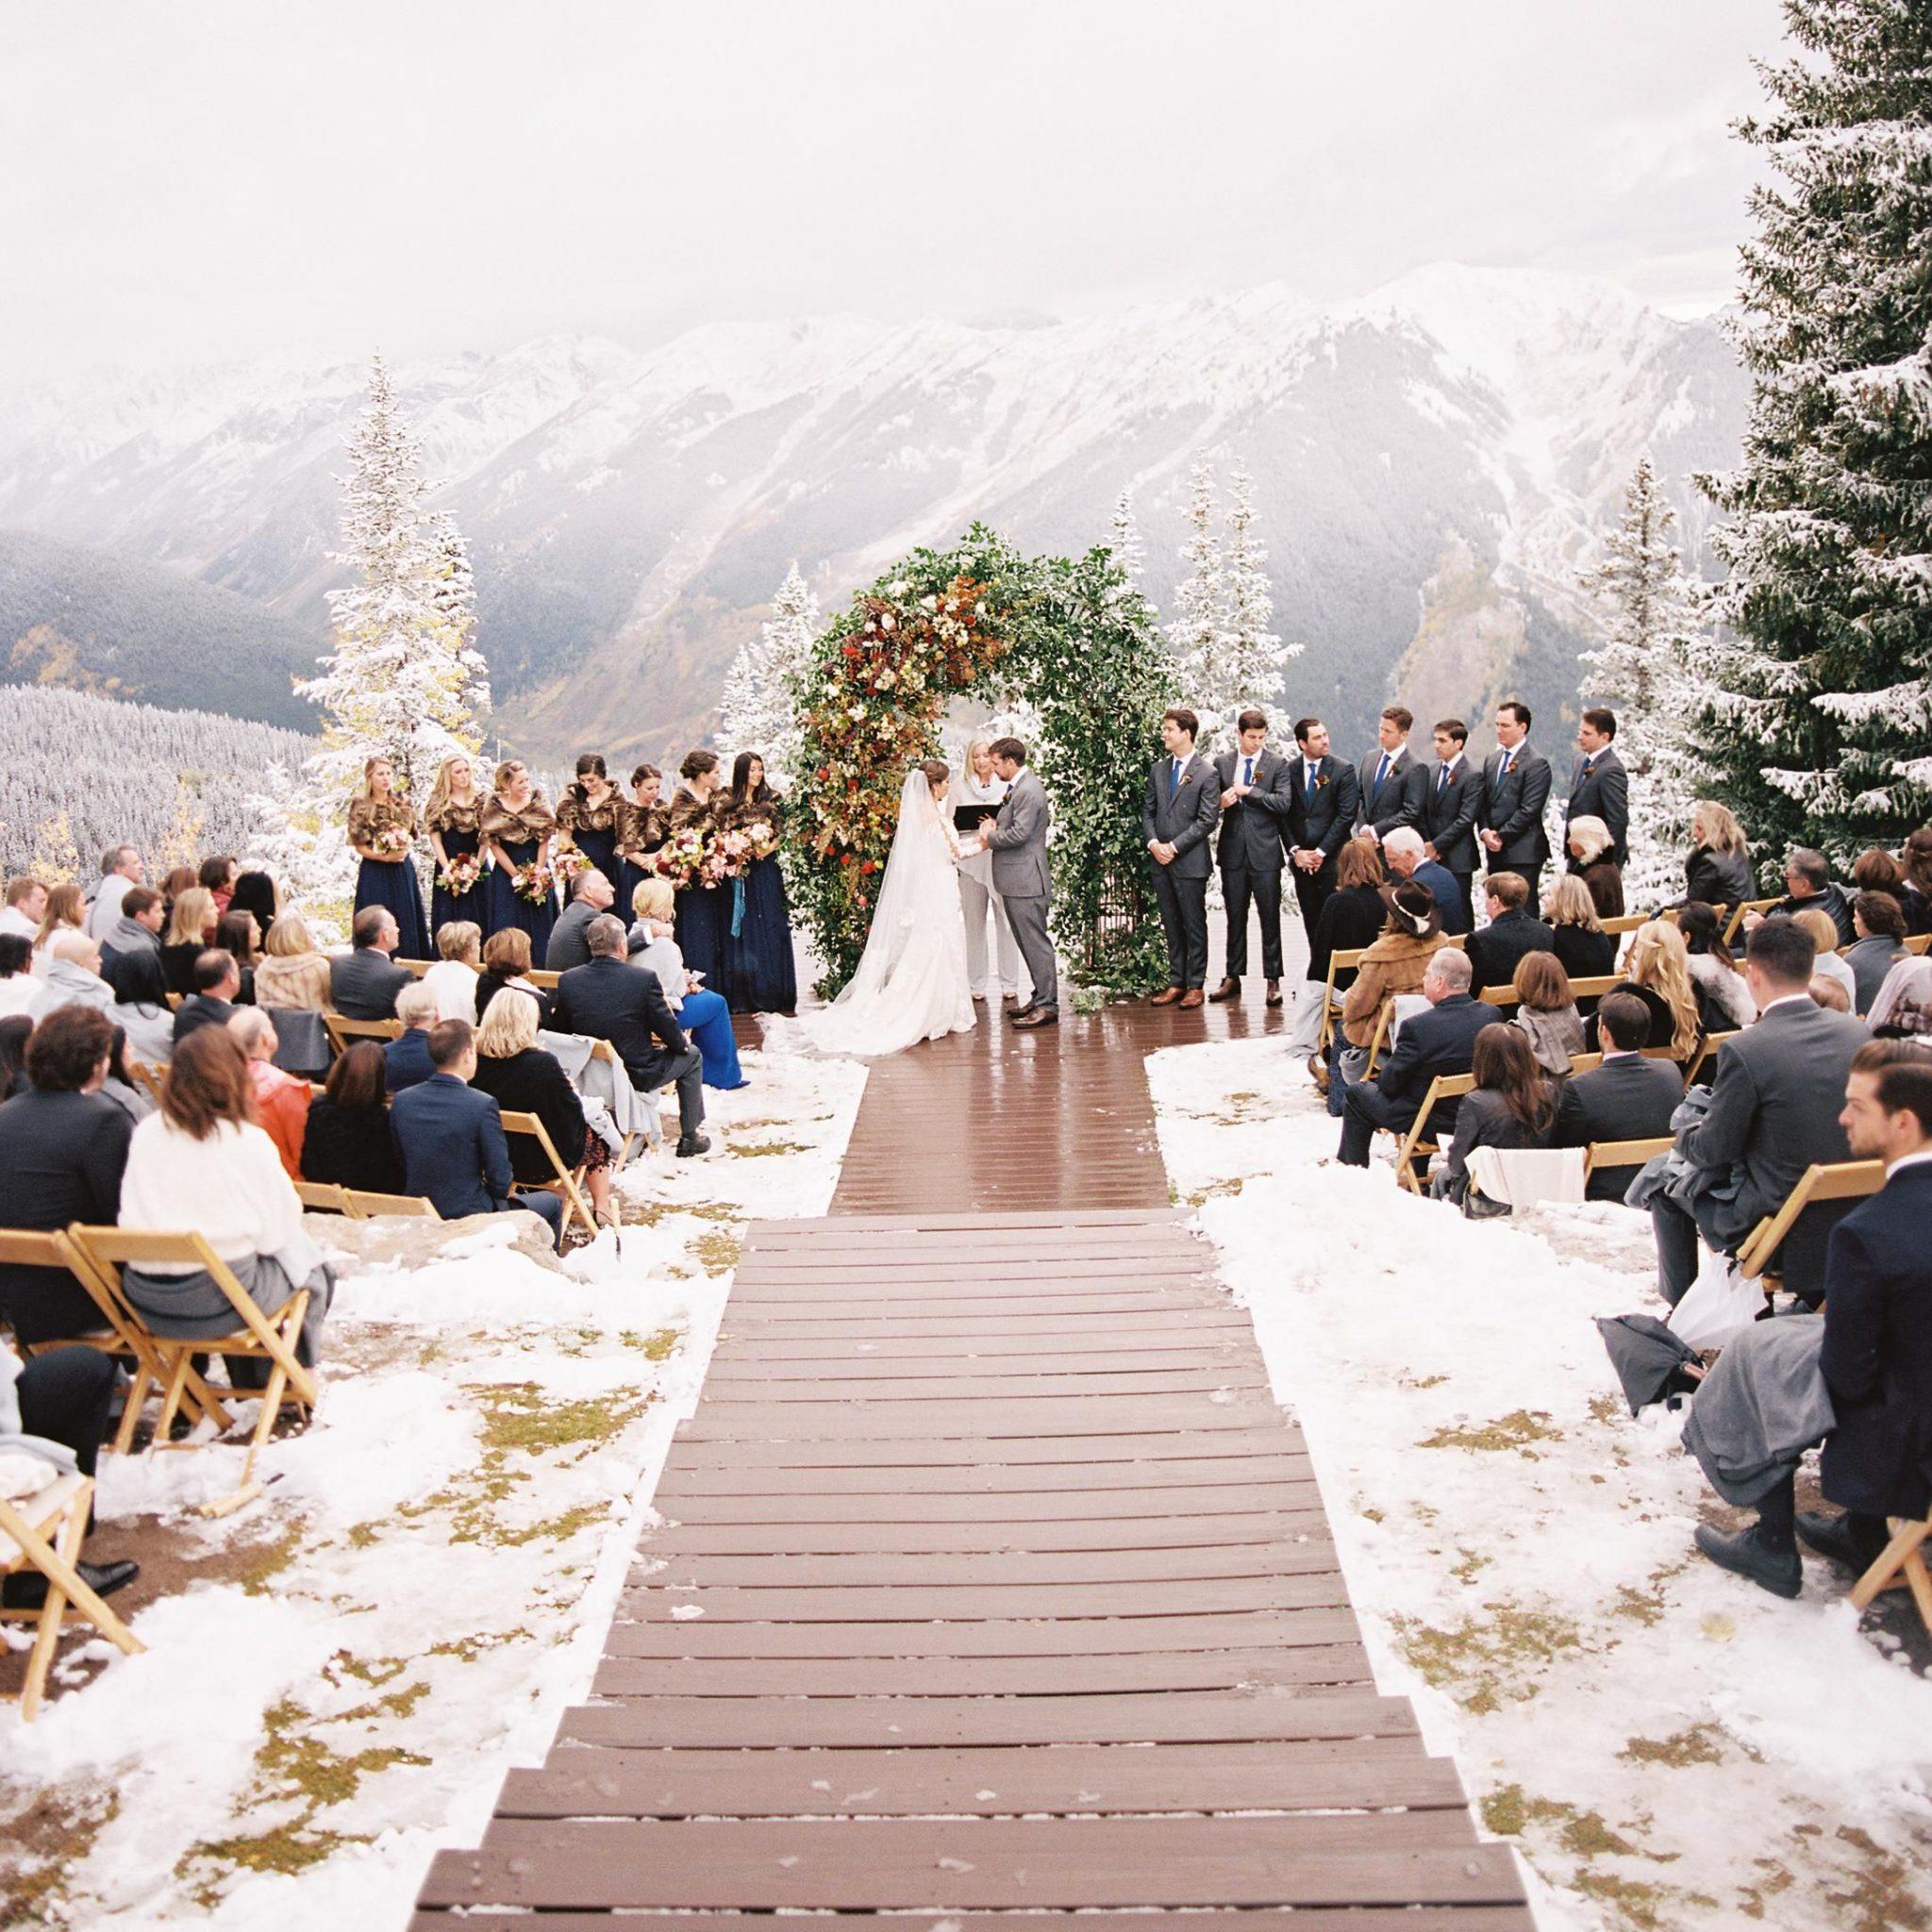 mariage d'hiver - organisation mariage - wedding planner lyon - les moments m